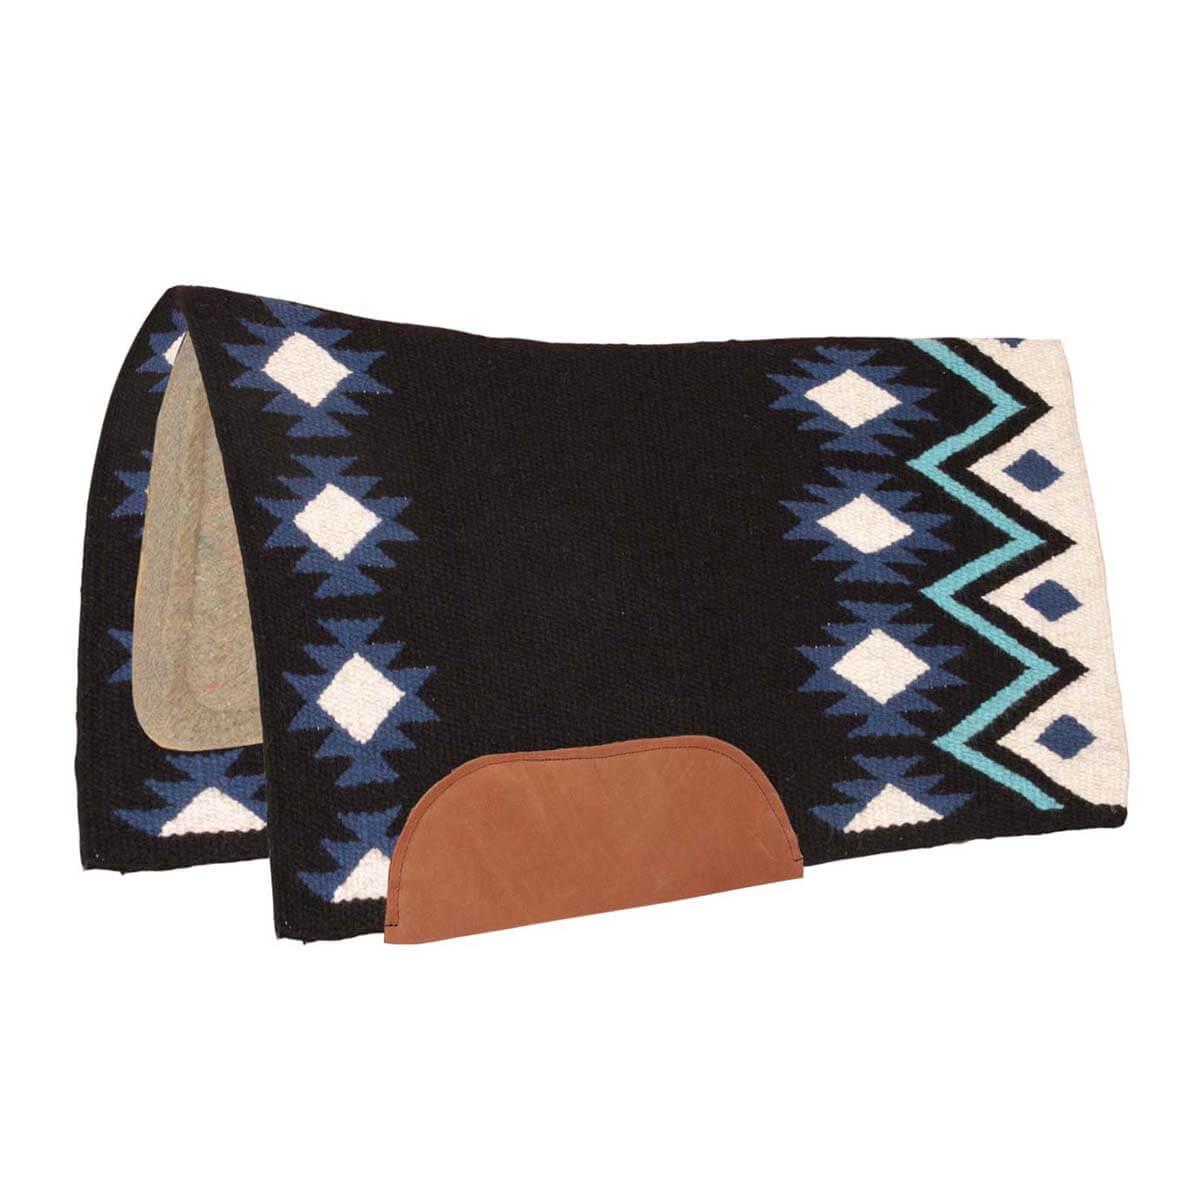 Aztec Contoured Saddle Pad W/ Wool Bottom